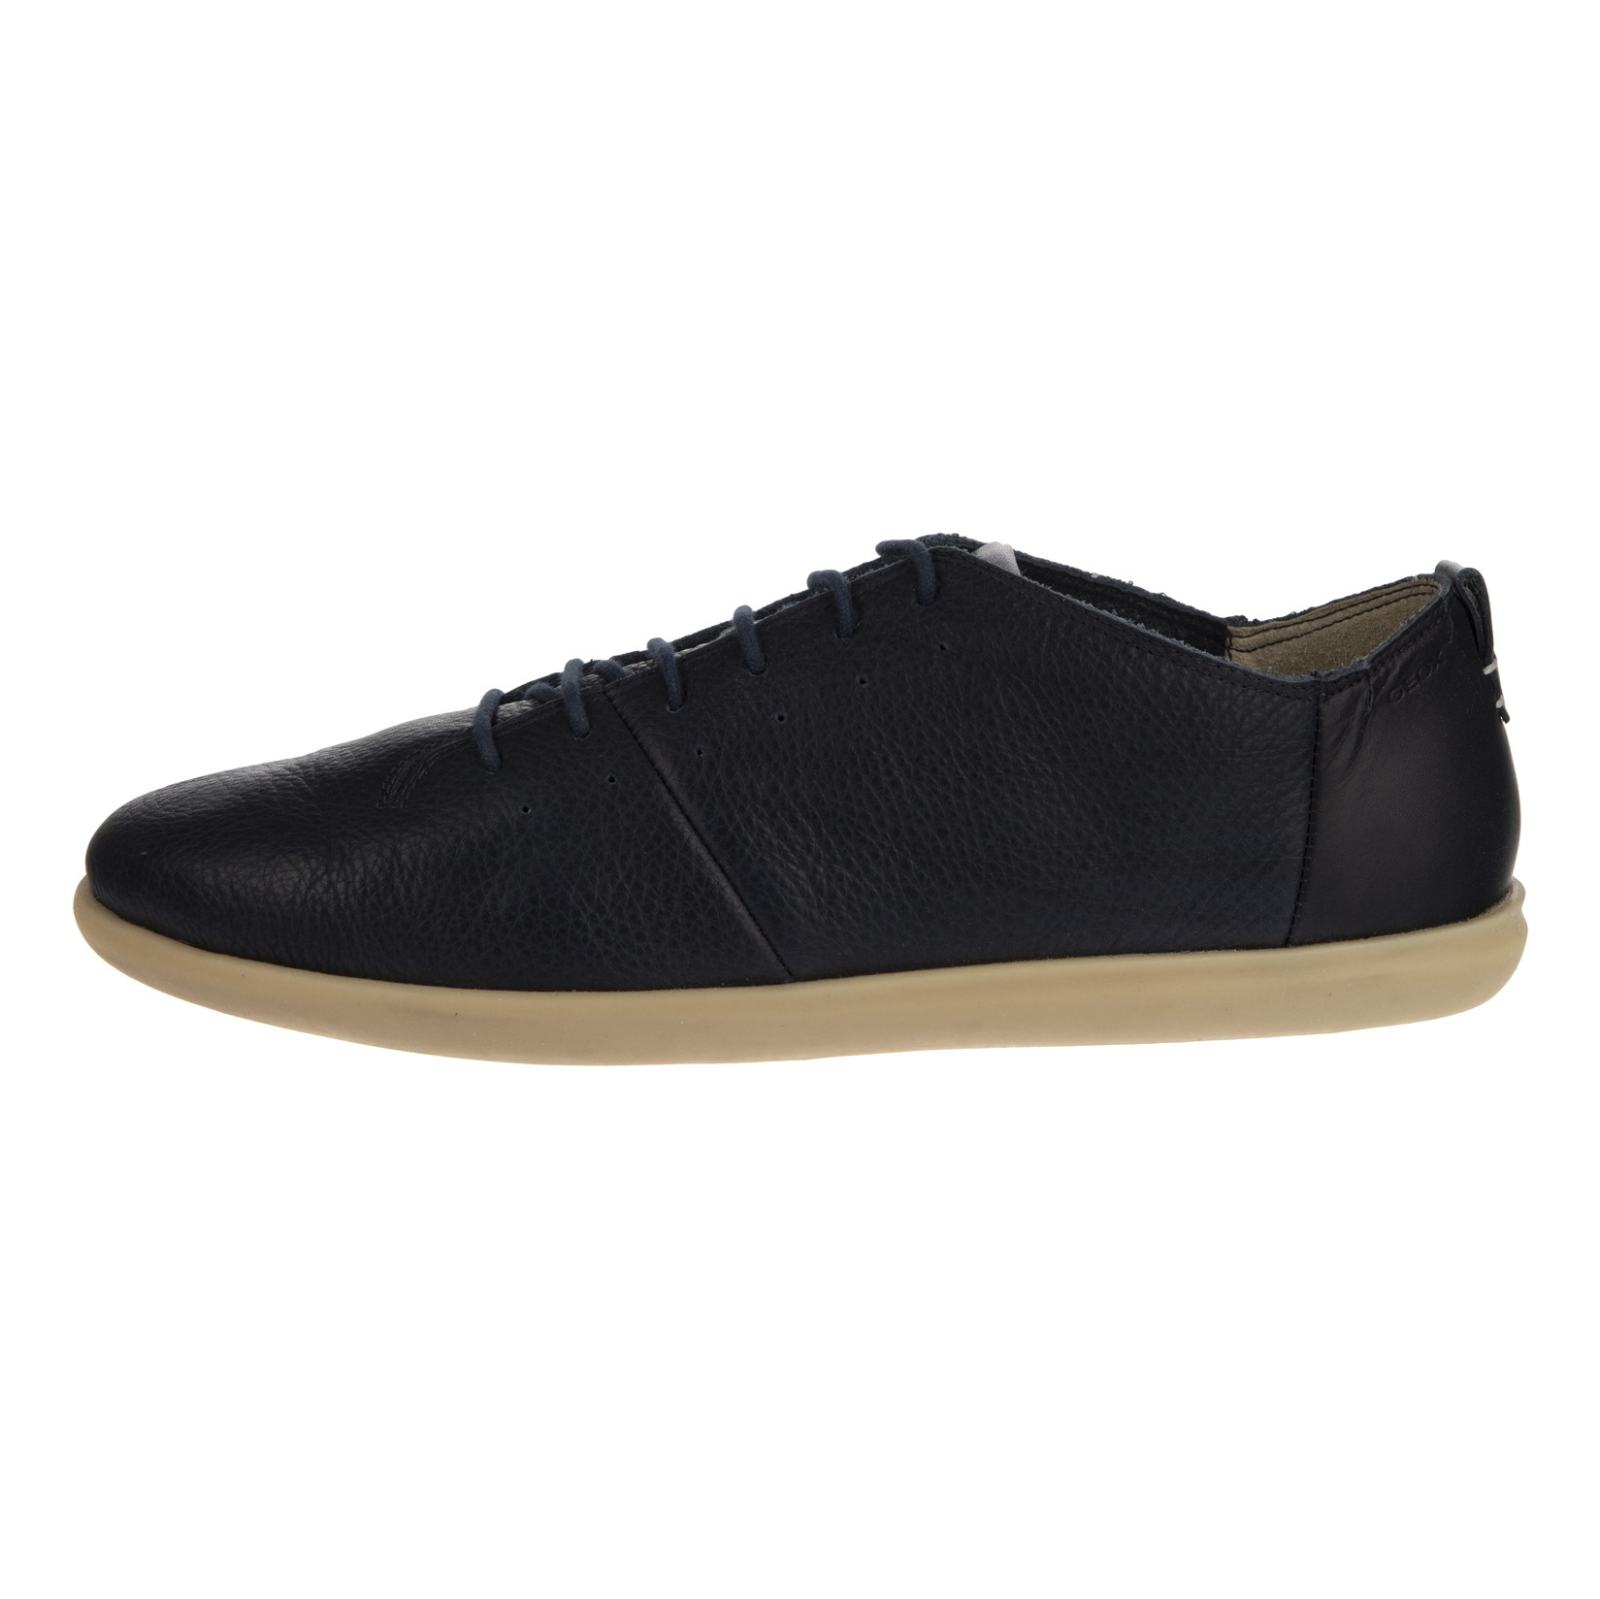 کفش روزمره مردانه جی اوکس مدل U620QB-04643-C4002 -  - 1